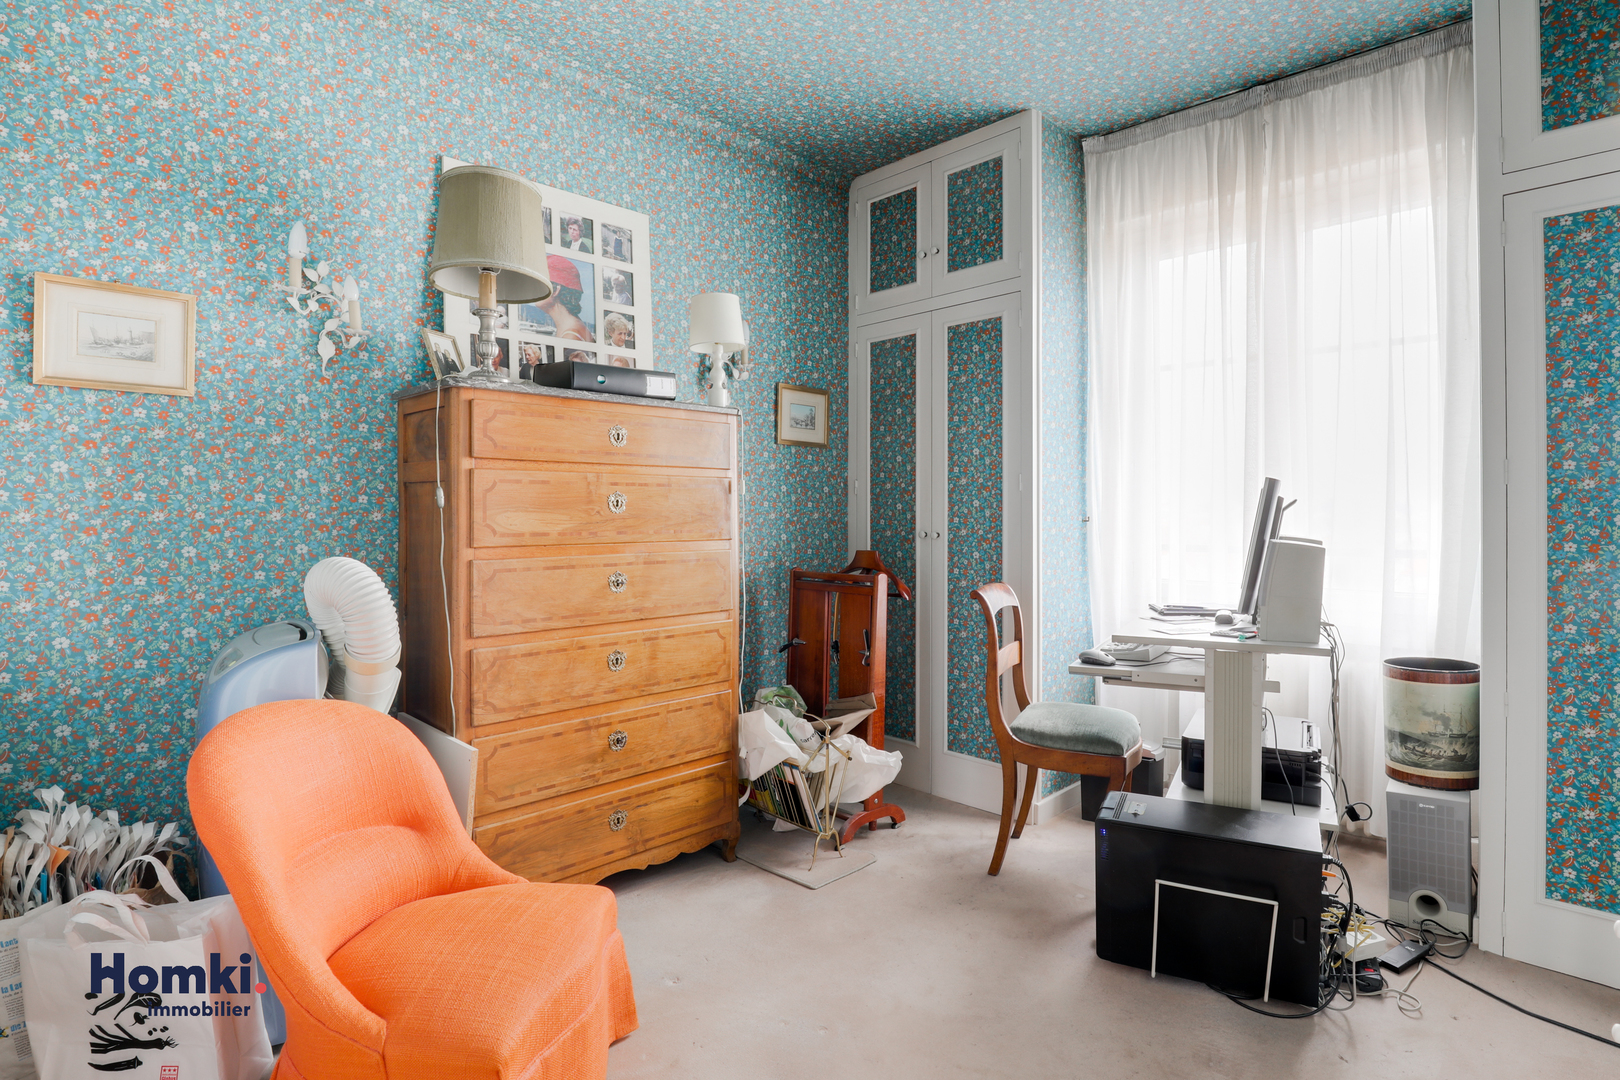 Appartement I 67m² I T3 I 69007 | photo 8